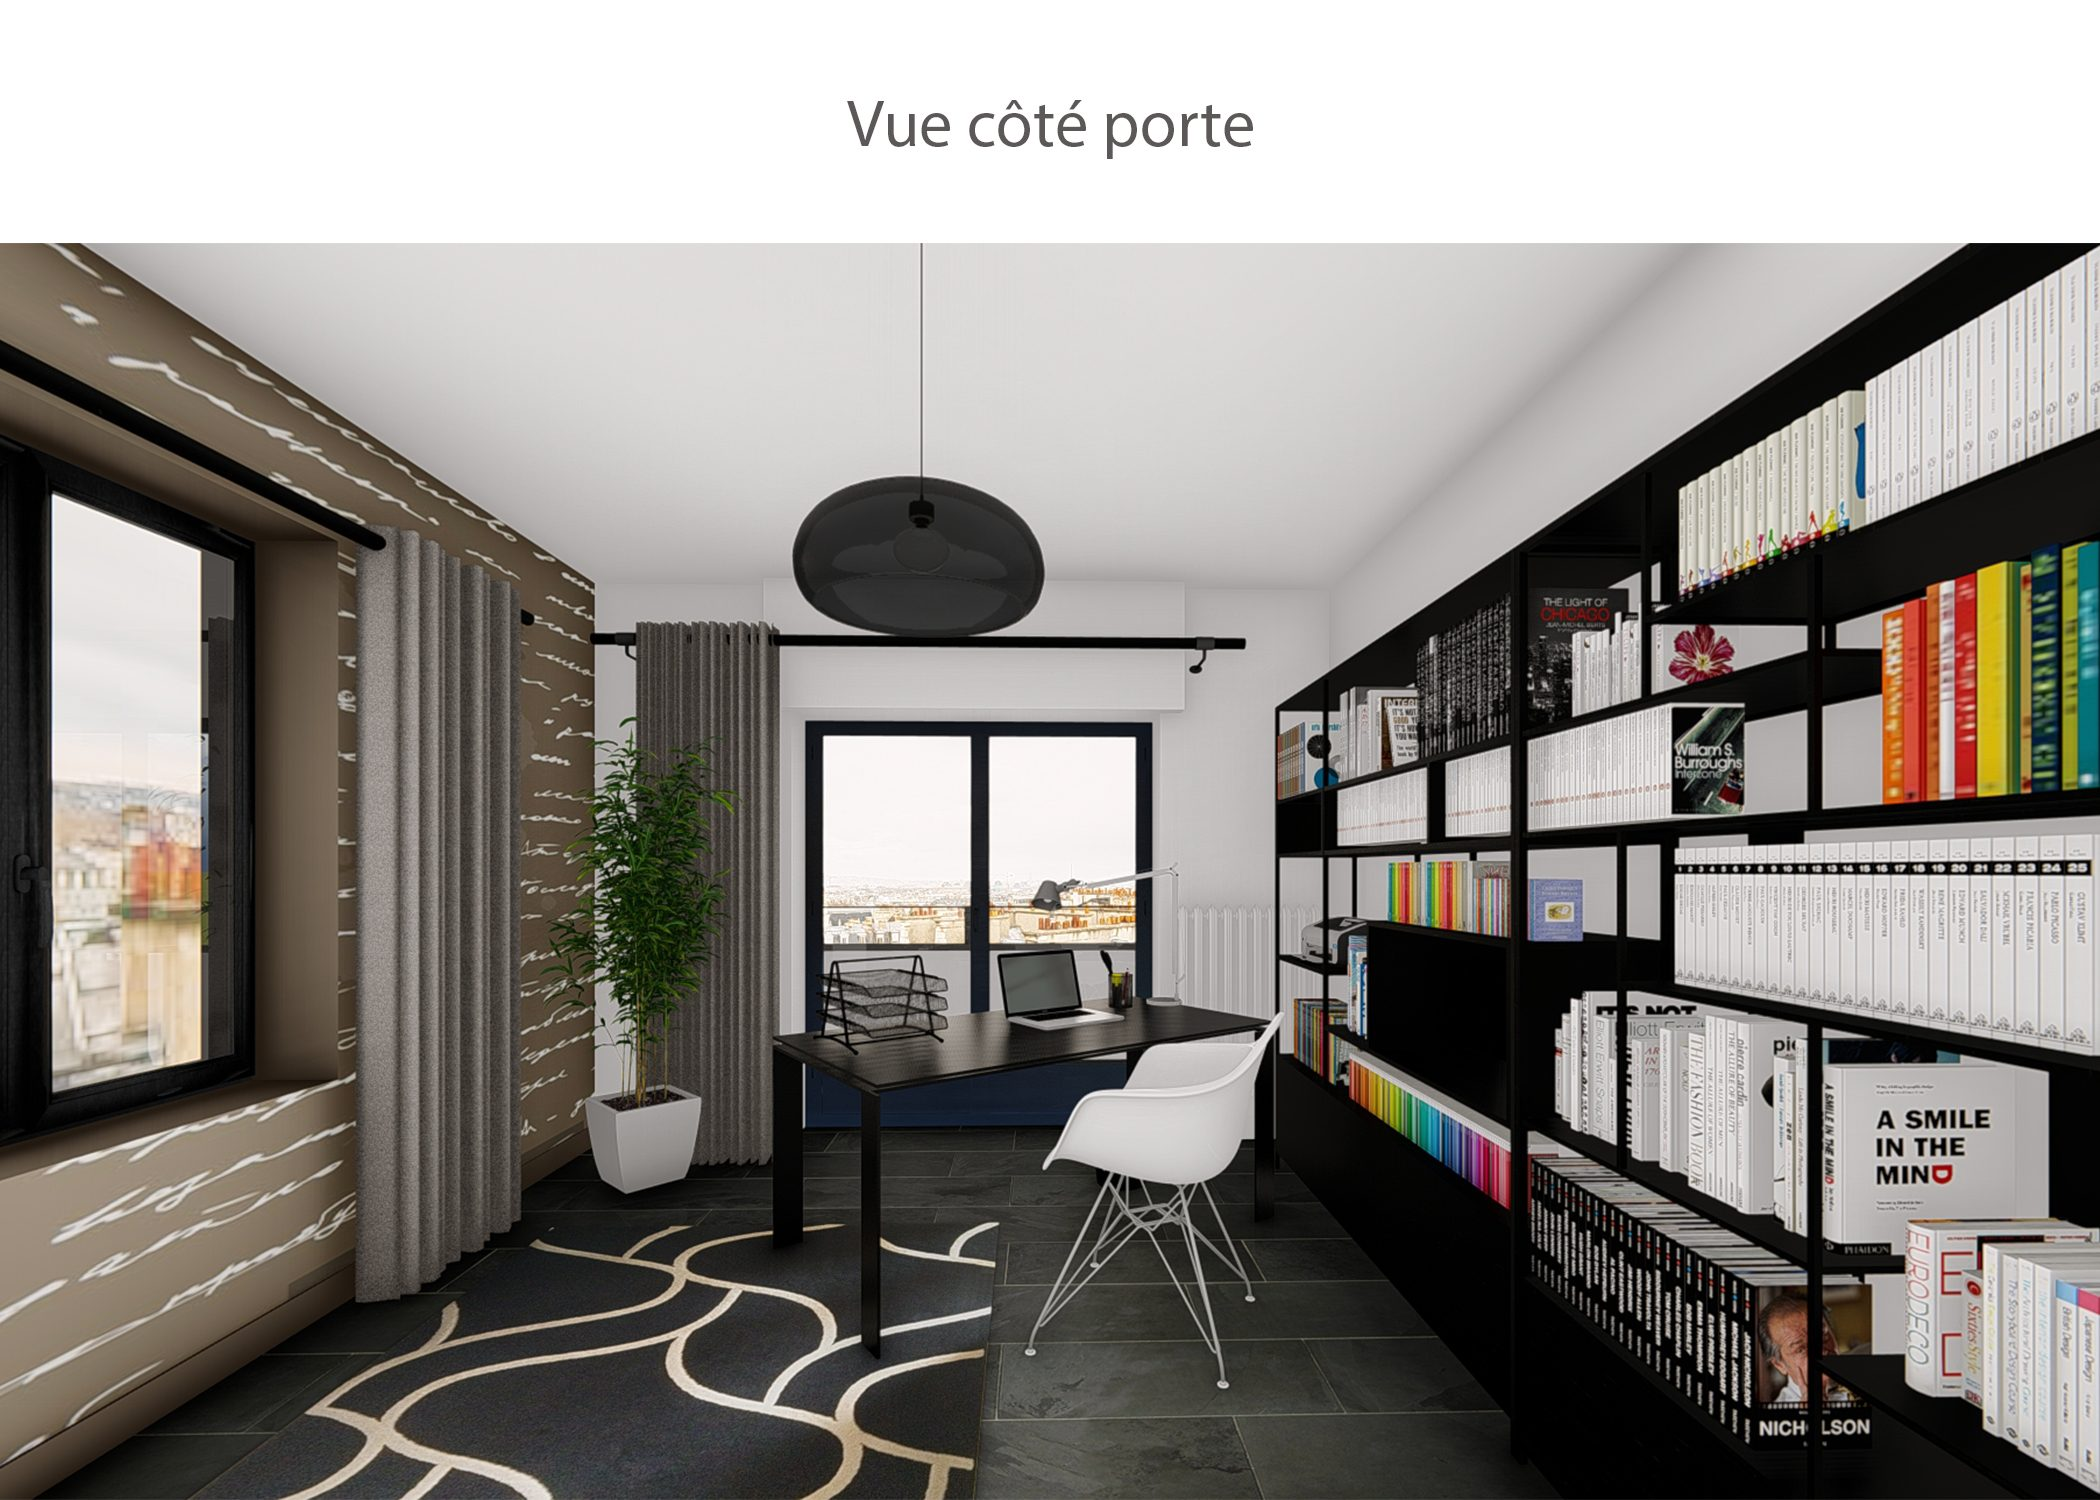 decoration-espace bureau-vue cote porte-paris-dekho design